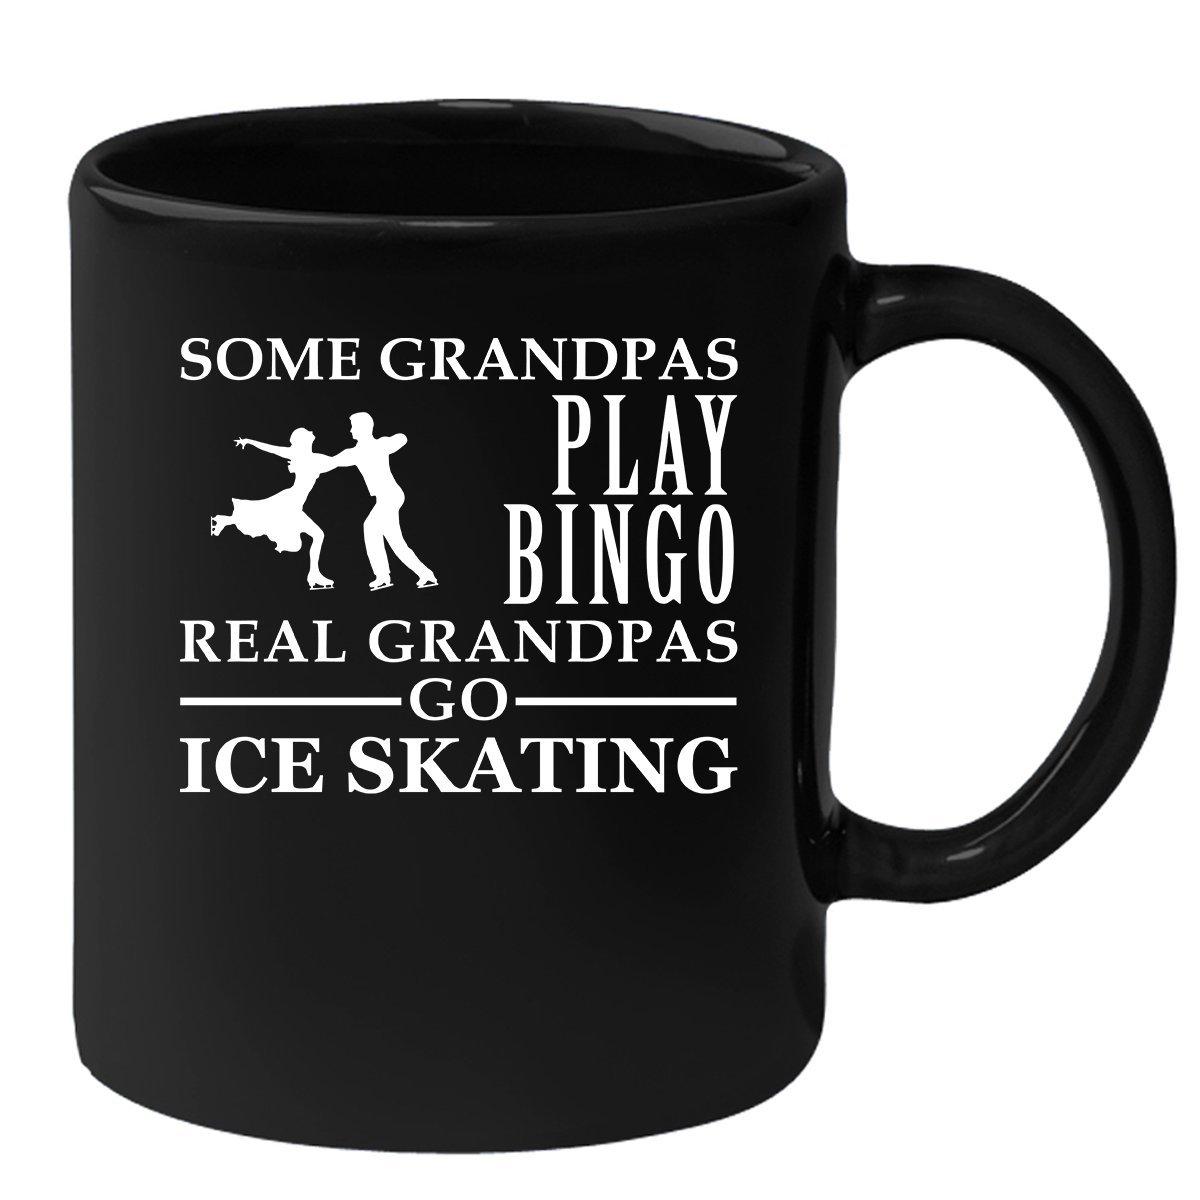 Ice Skating Black Coffee Mug, Grandpa Birthday Present Mug, Funny Mug for Coffee 11oz Some Grandpas play bingo, real Grandpas go Ice Skating